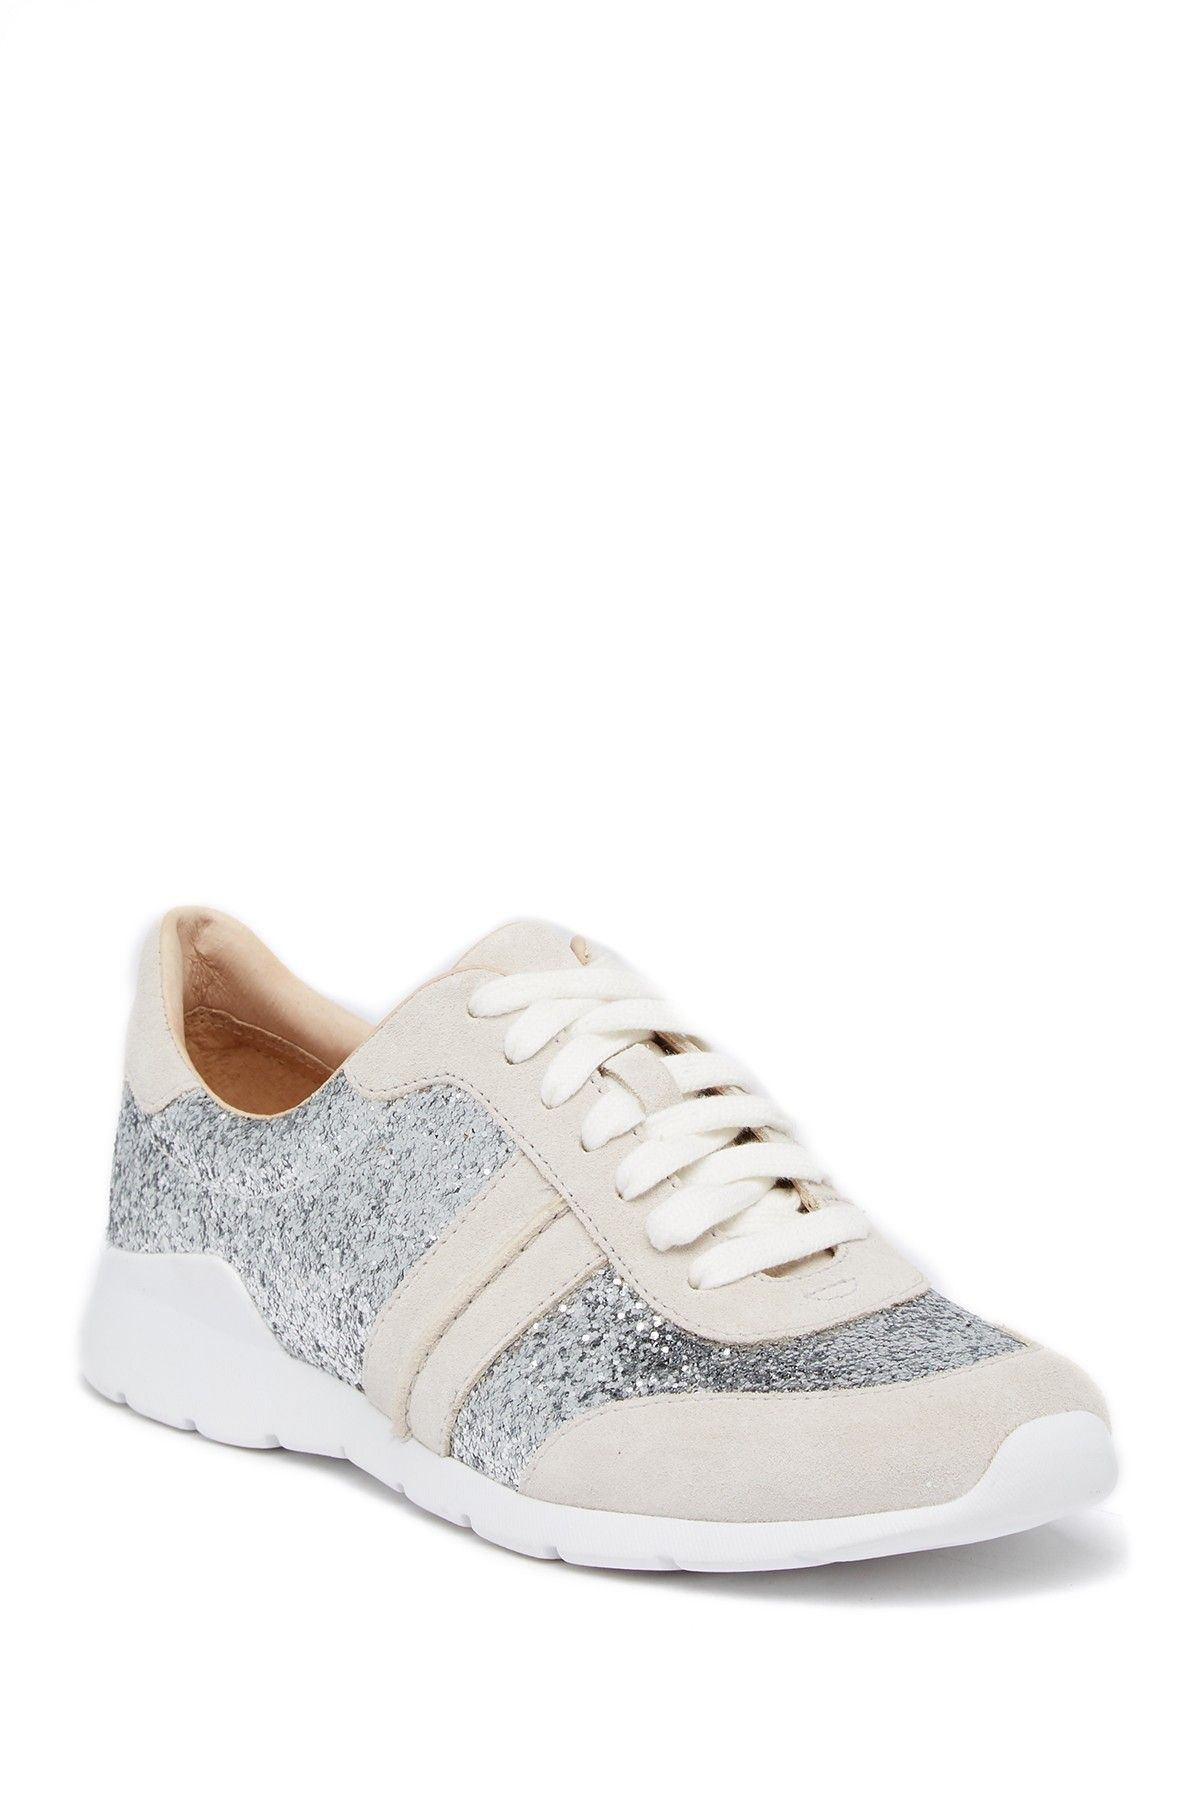 cb0abdf9e4c UGG   Jaida Glitter Sneaker DO NOT SET LIVE in 2019   Products ...